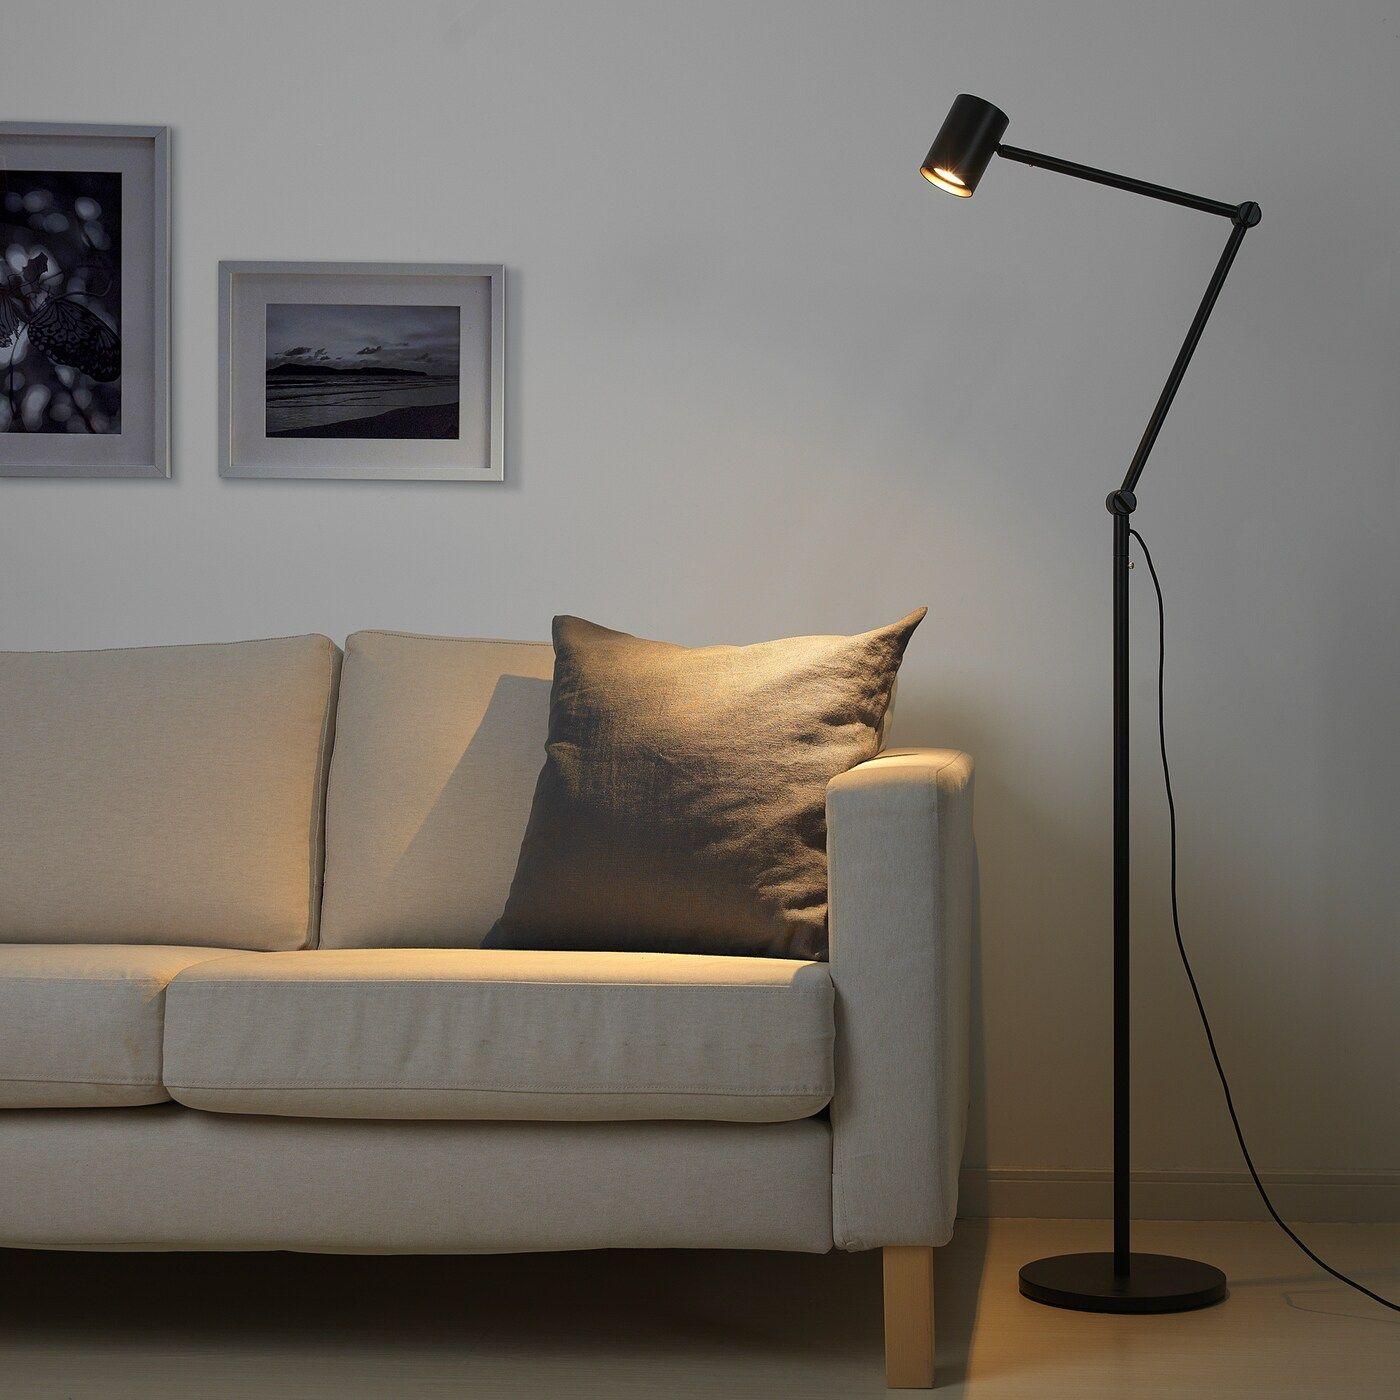 Nymane Floor Reading Lamp Anthracite Ikea In 2020 Reading Lamp Floor Reading Lamp Reading Lamps Living Room